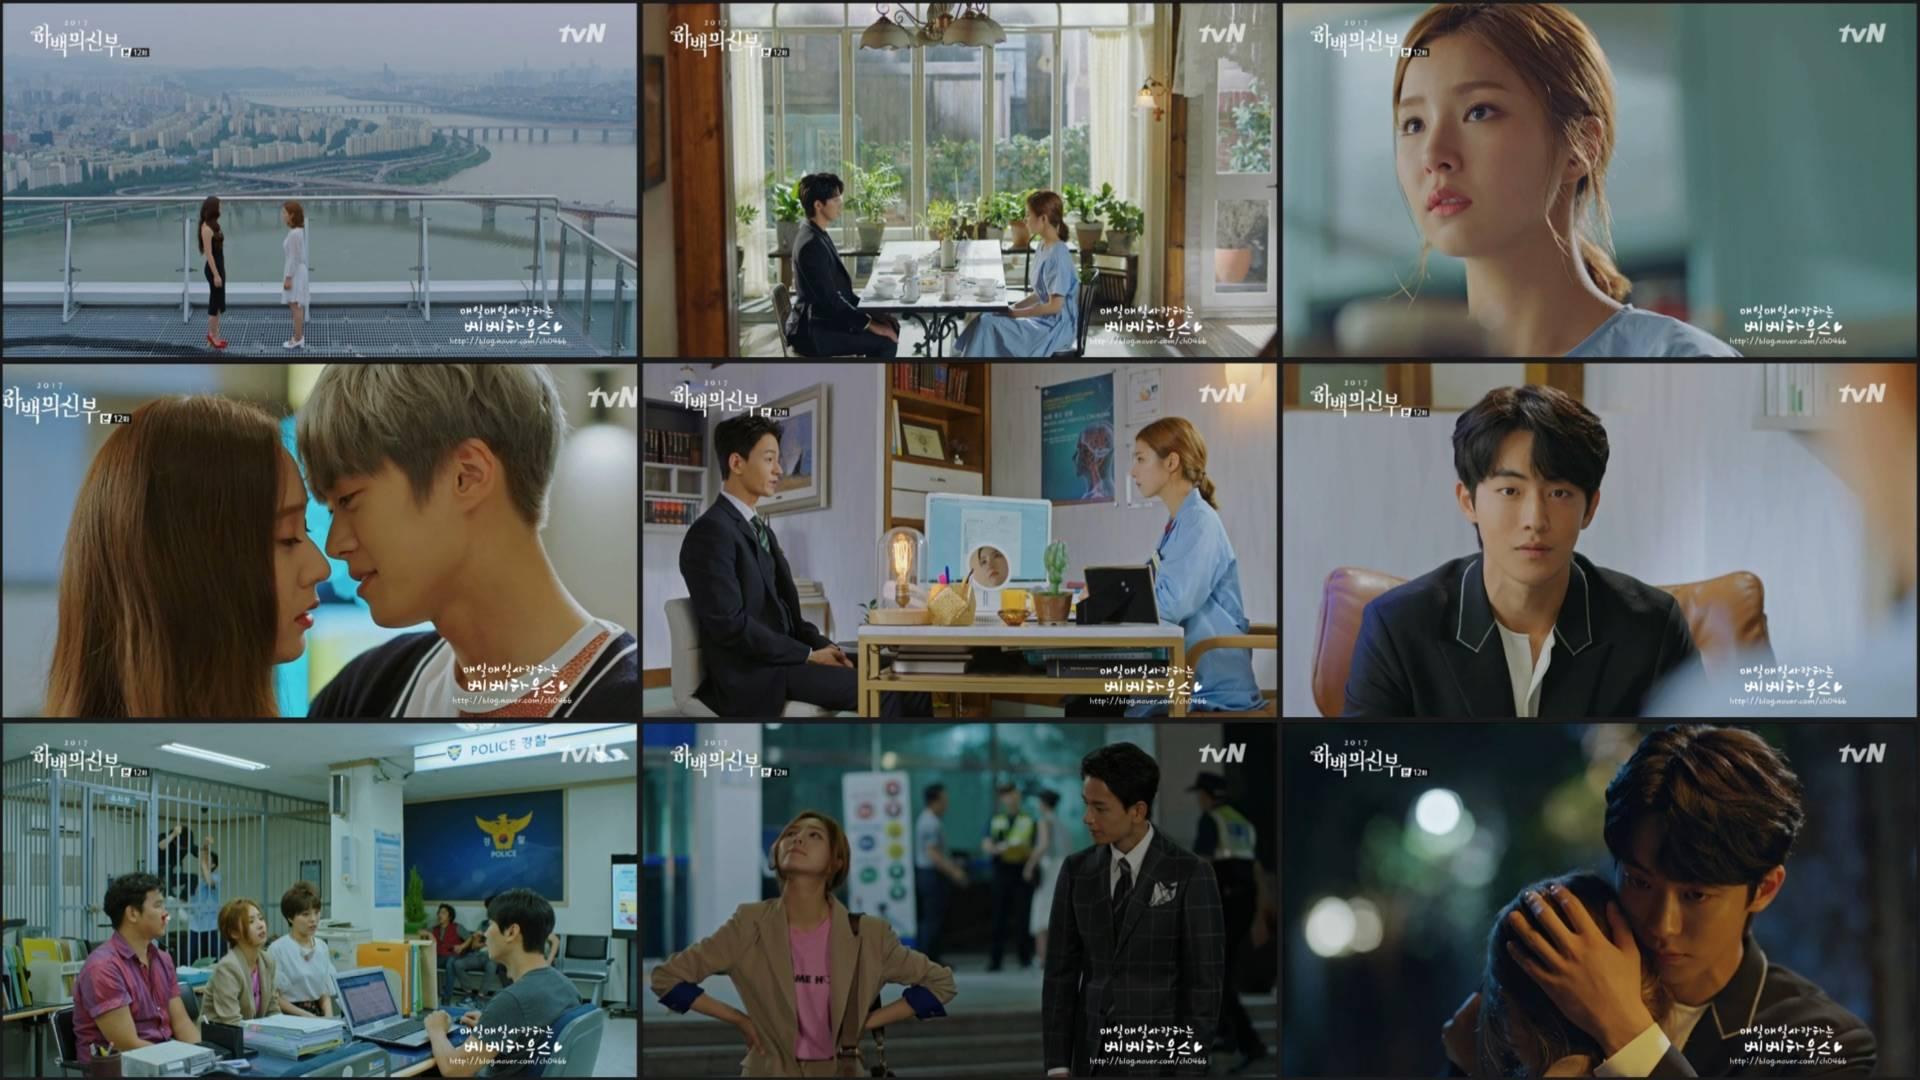 Drama korea poseidon episode 12 / Wild orchid movie love scenes